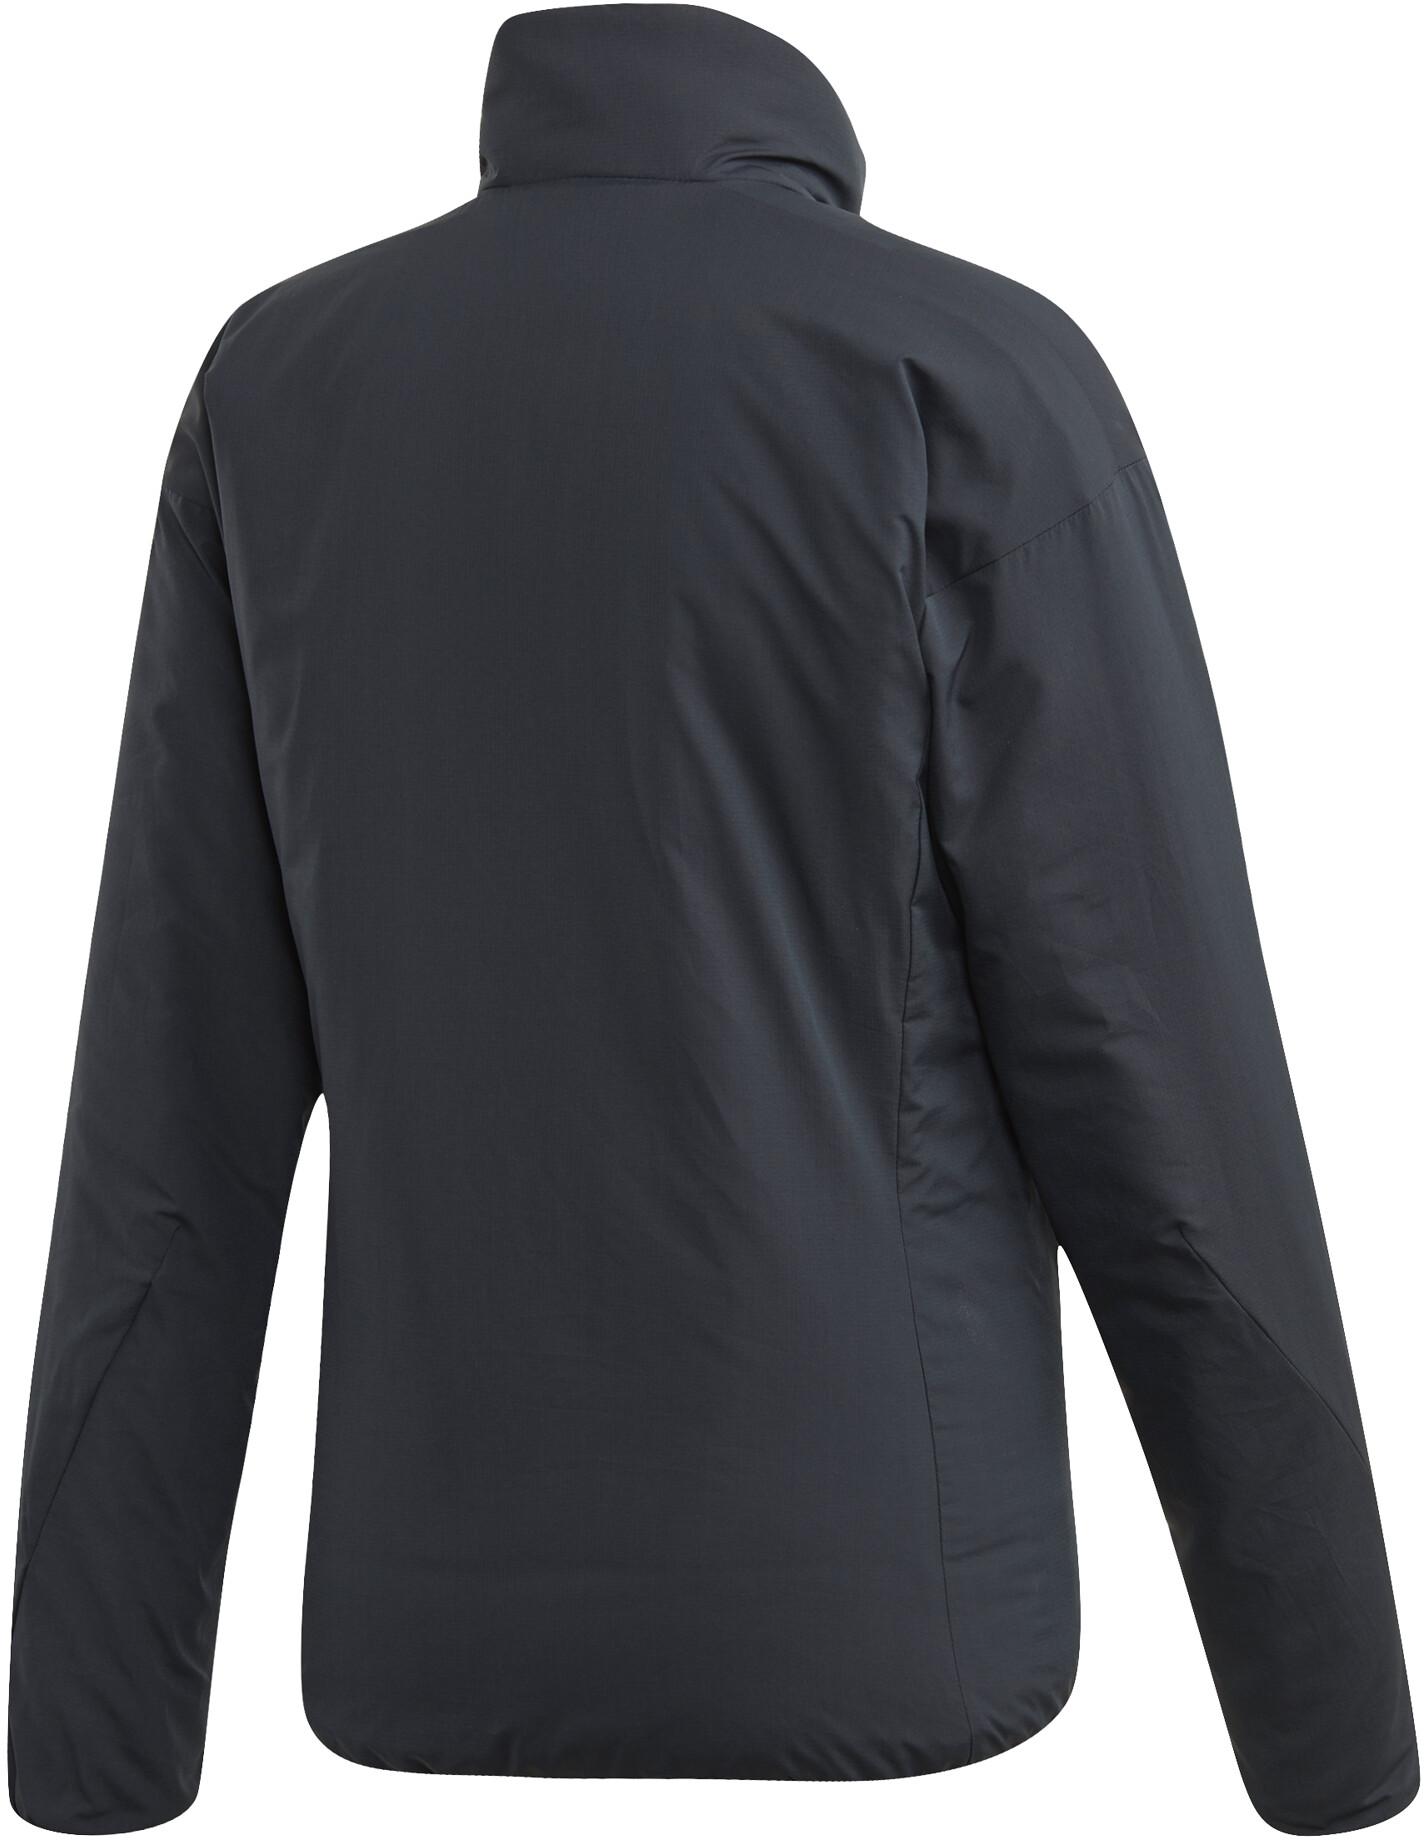 adidas TERREX Inmotion Light Jacket Women carbon